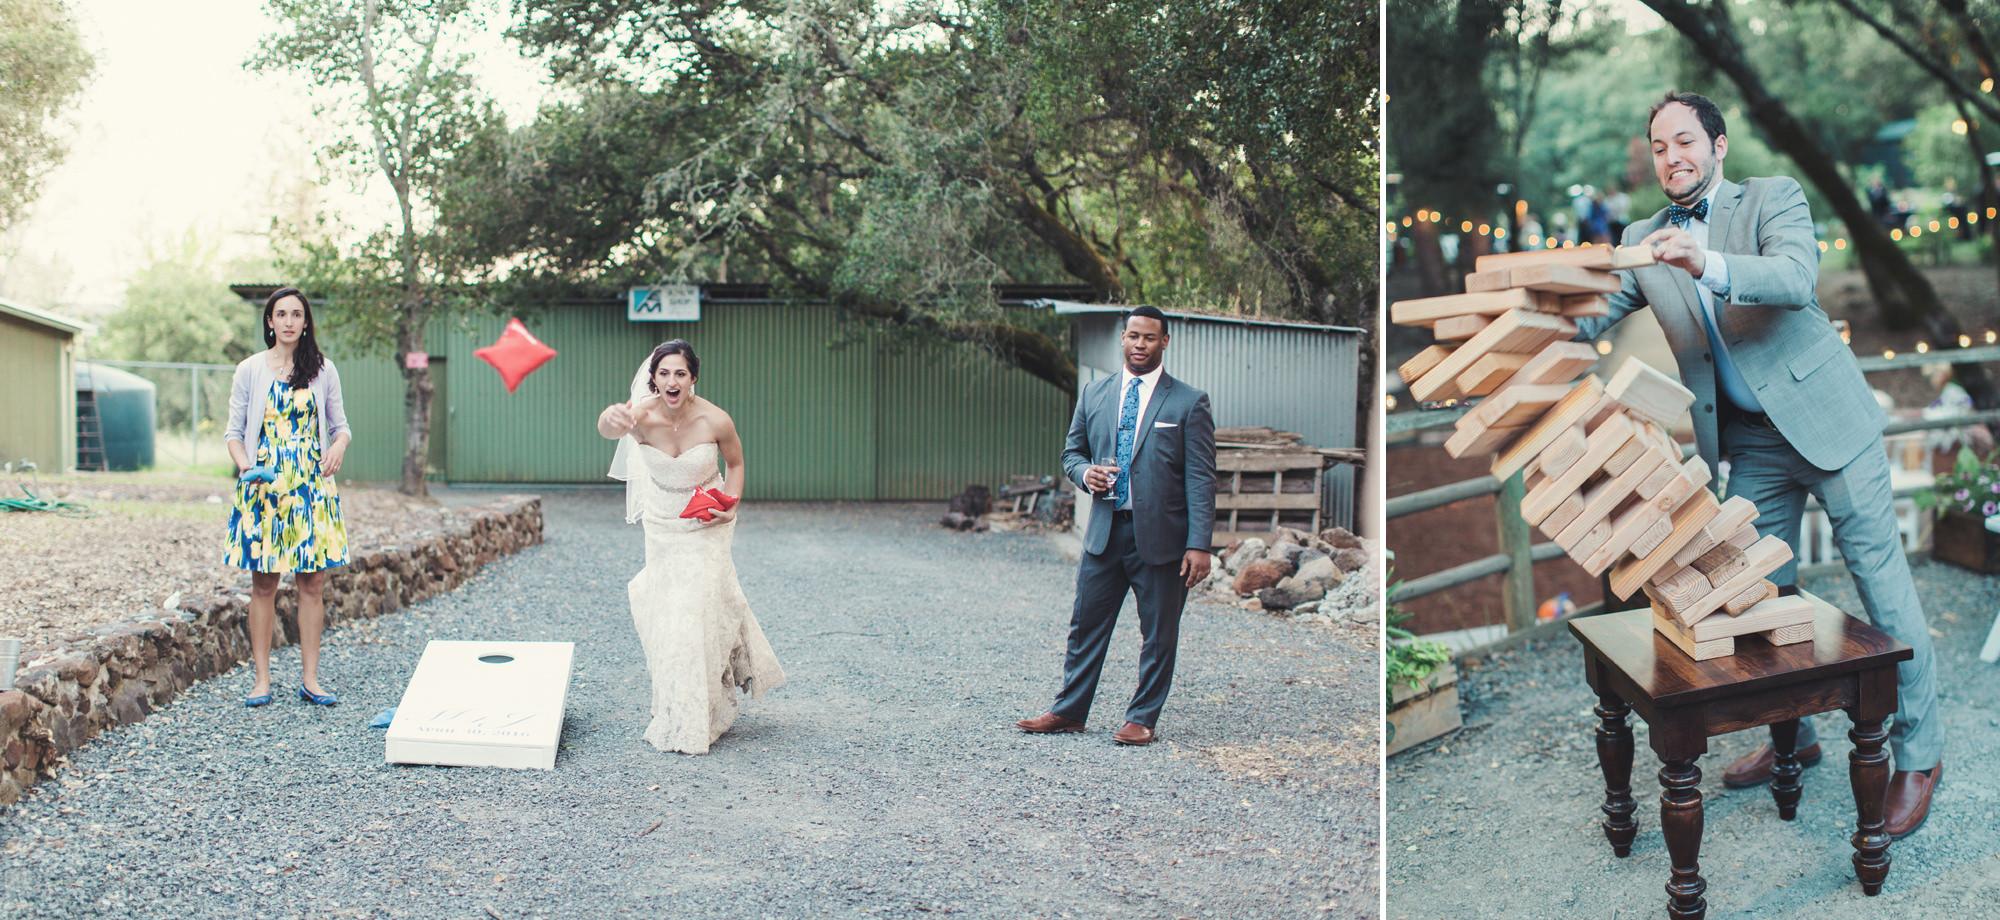 Backyard Wedding in California©Anne-Claire Brun 0032